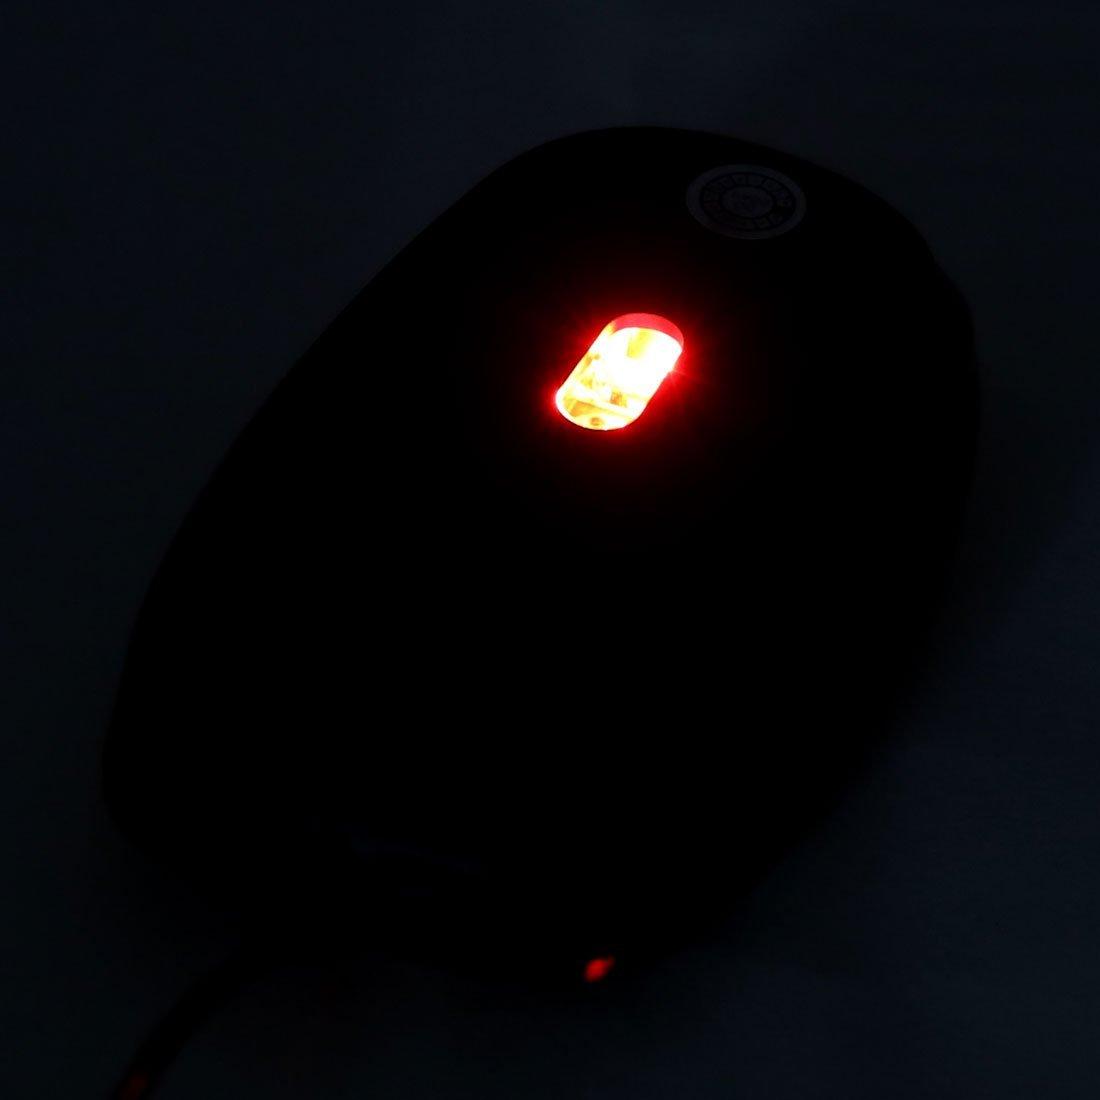 Amazon.com: eDealMax Oficina PC Ordenador portátil LED Rojo USB 2.0 ratón óptico de 800 DPI ratones 3D: Electronics